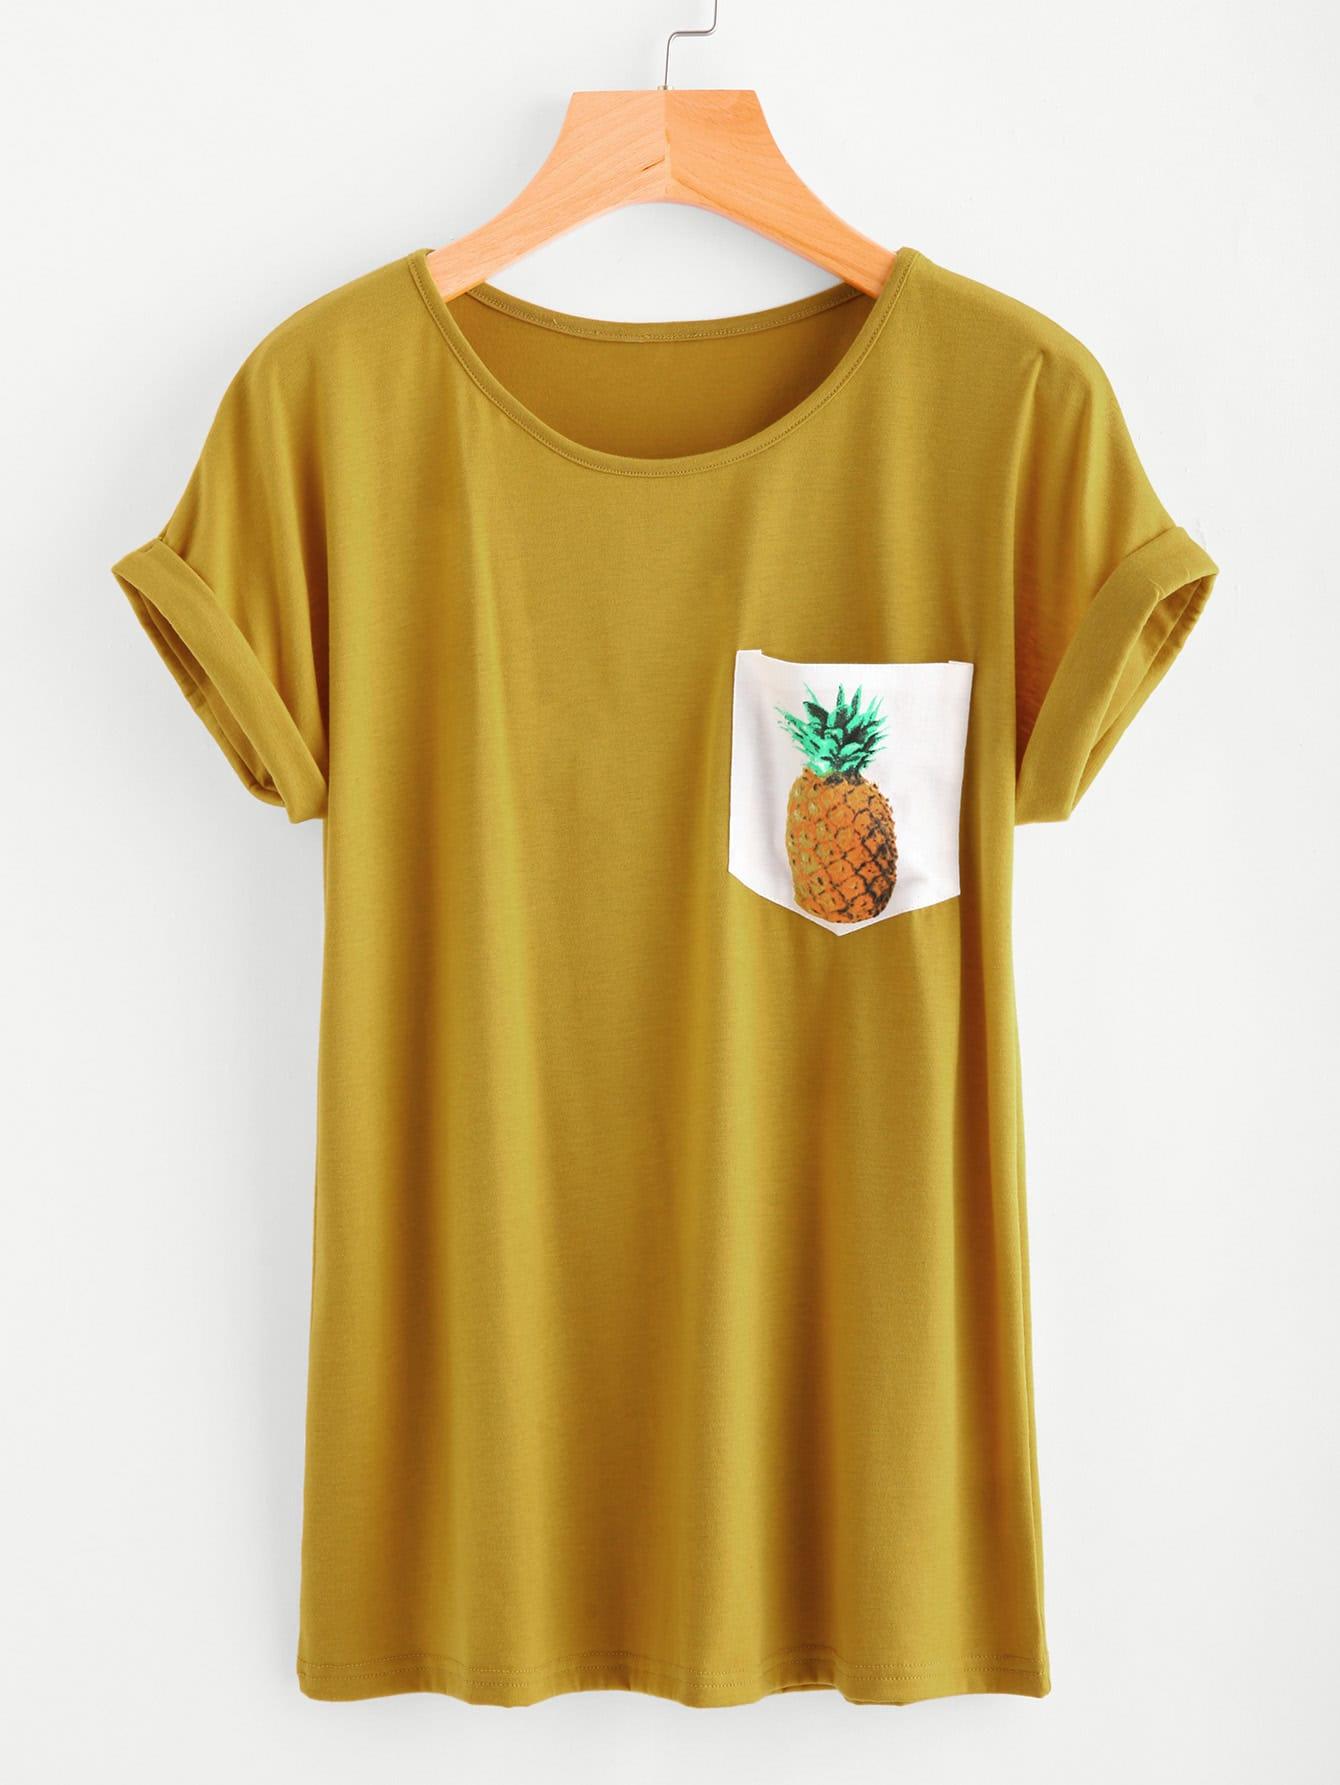 Фото Contrast Pineapple Print Pocket Cuffed Tee. Купить с доставкой